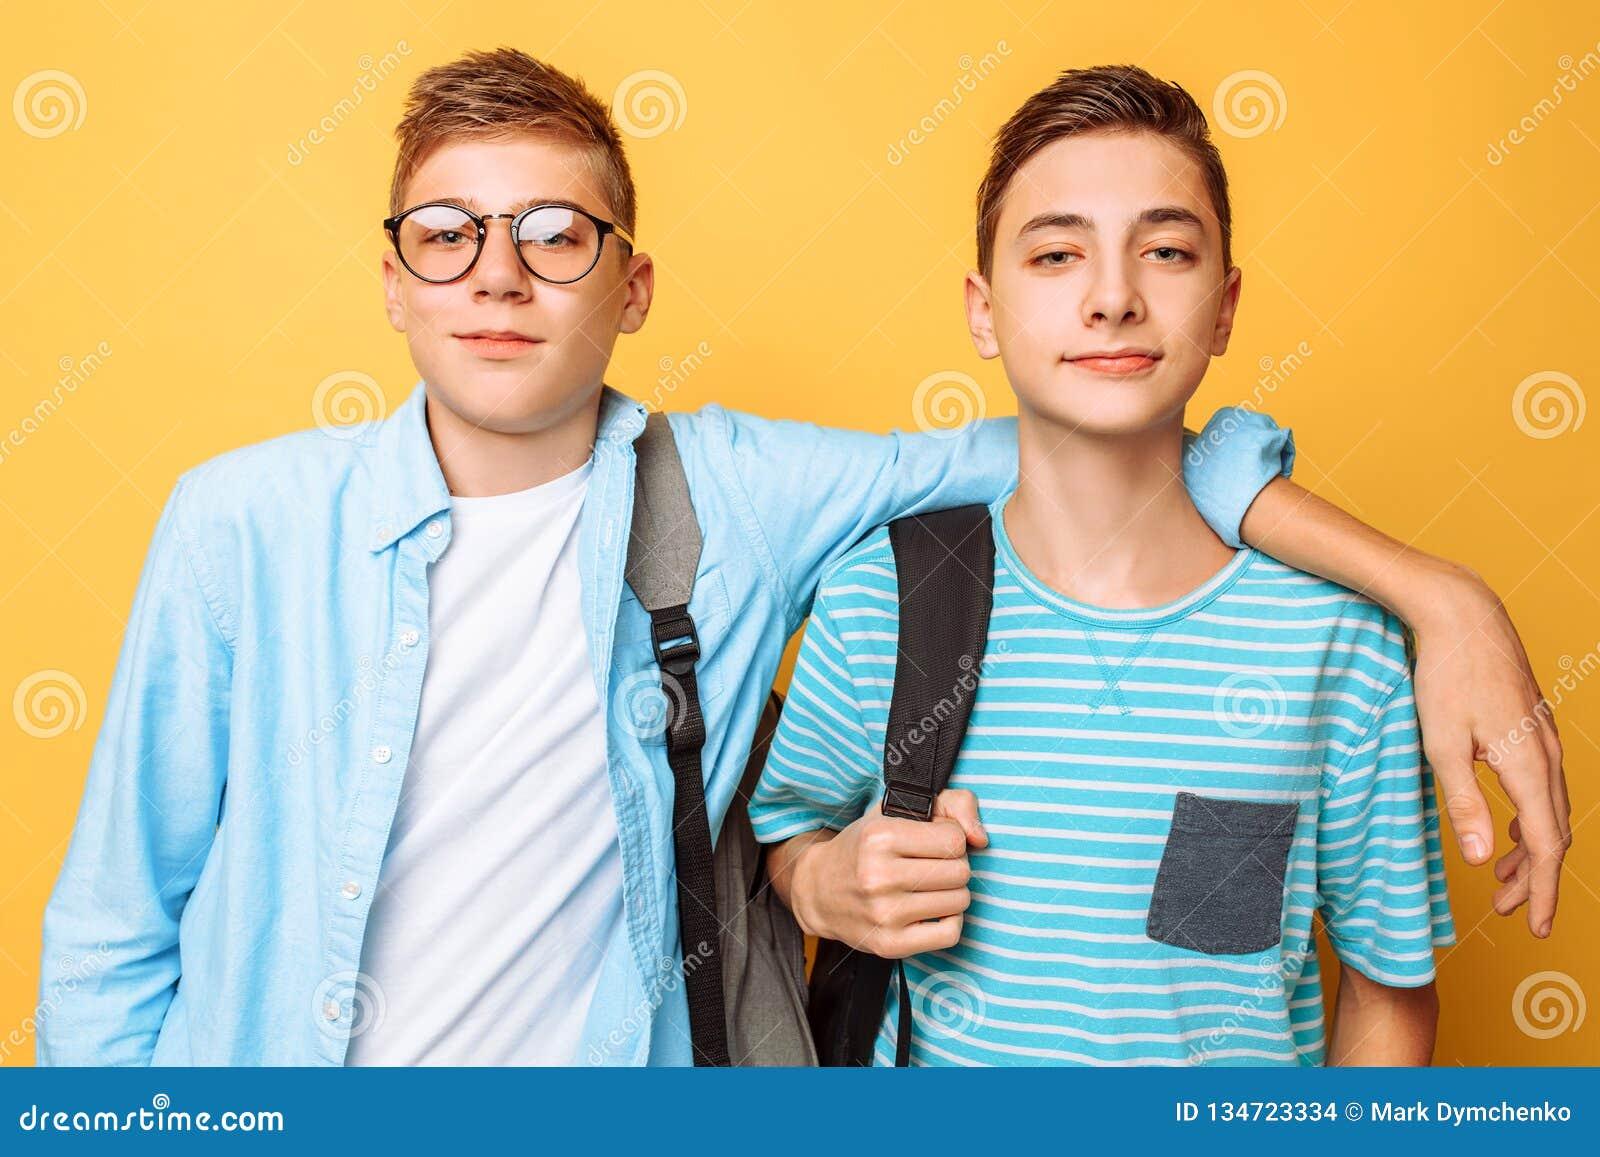 Retrato de dois indivíduos à moda felizes, adolescentes, isolados no fundo amarelo